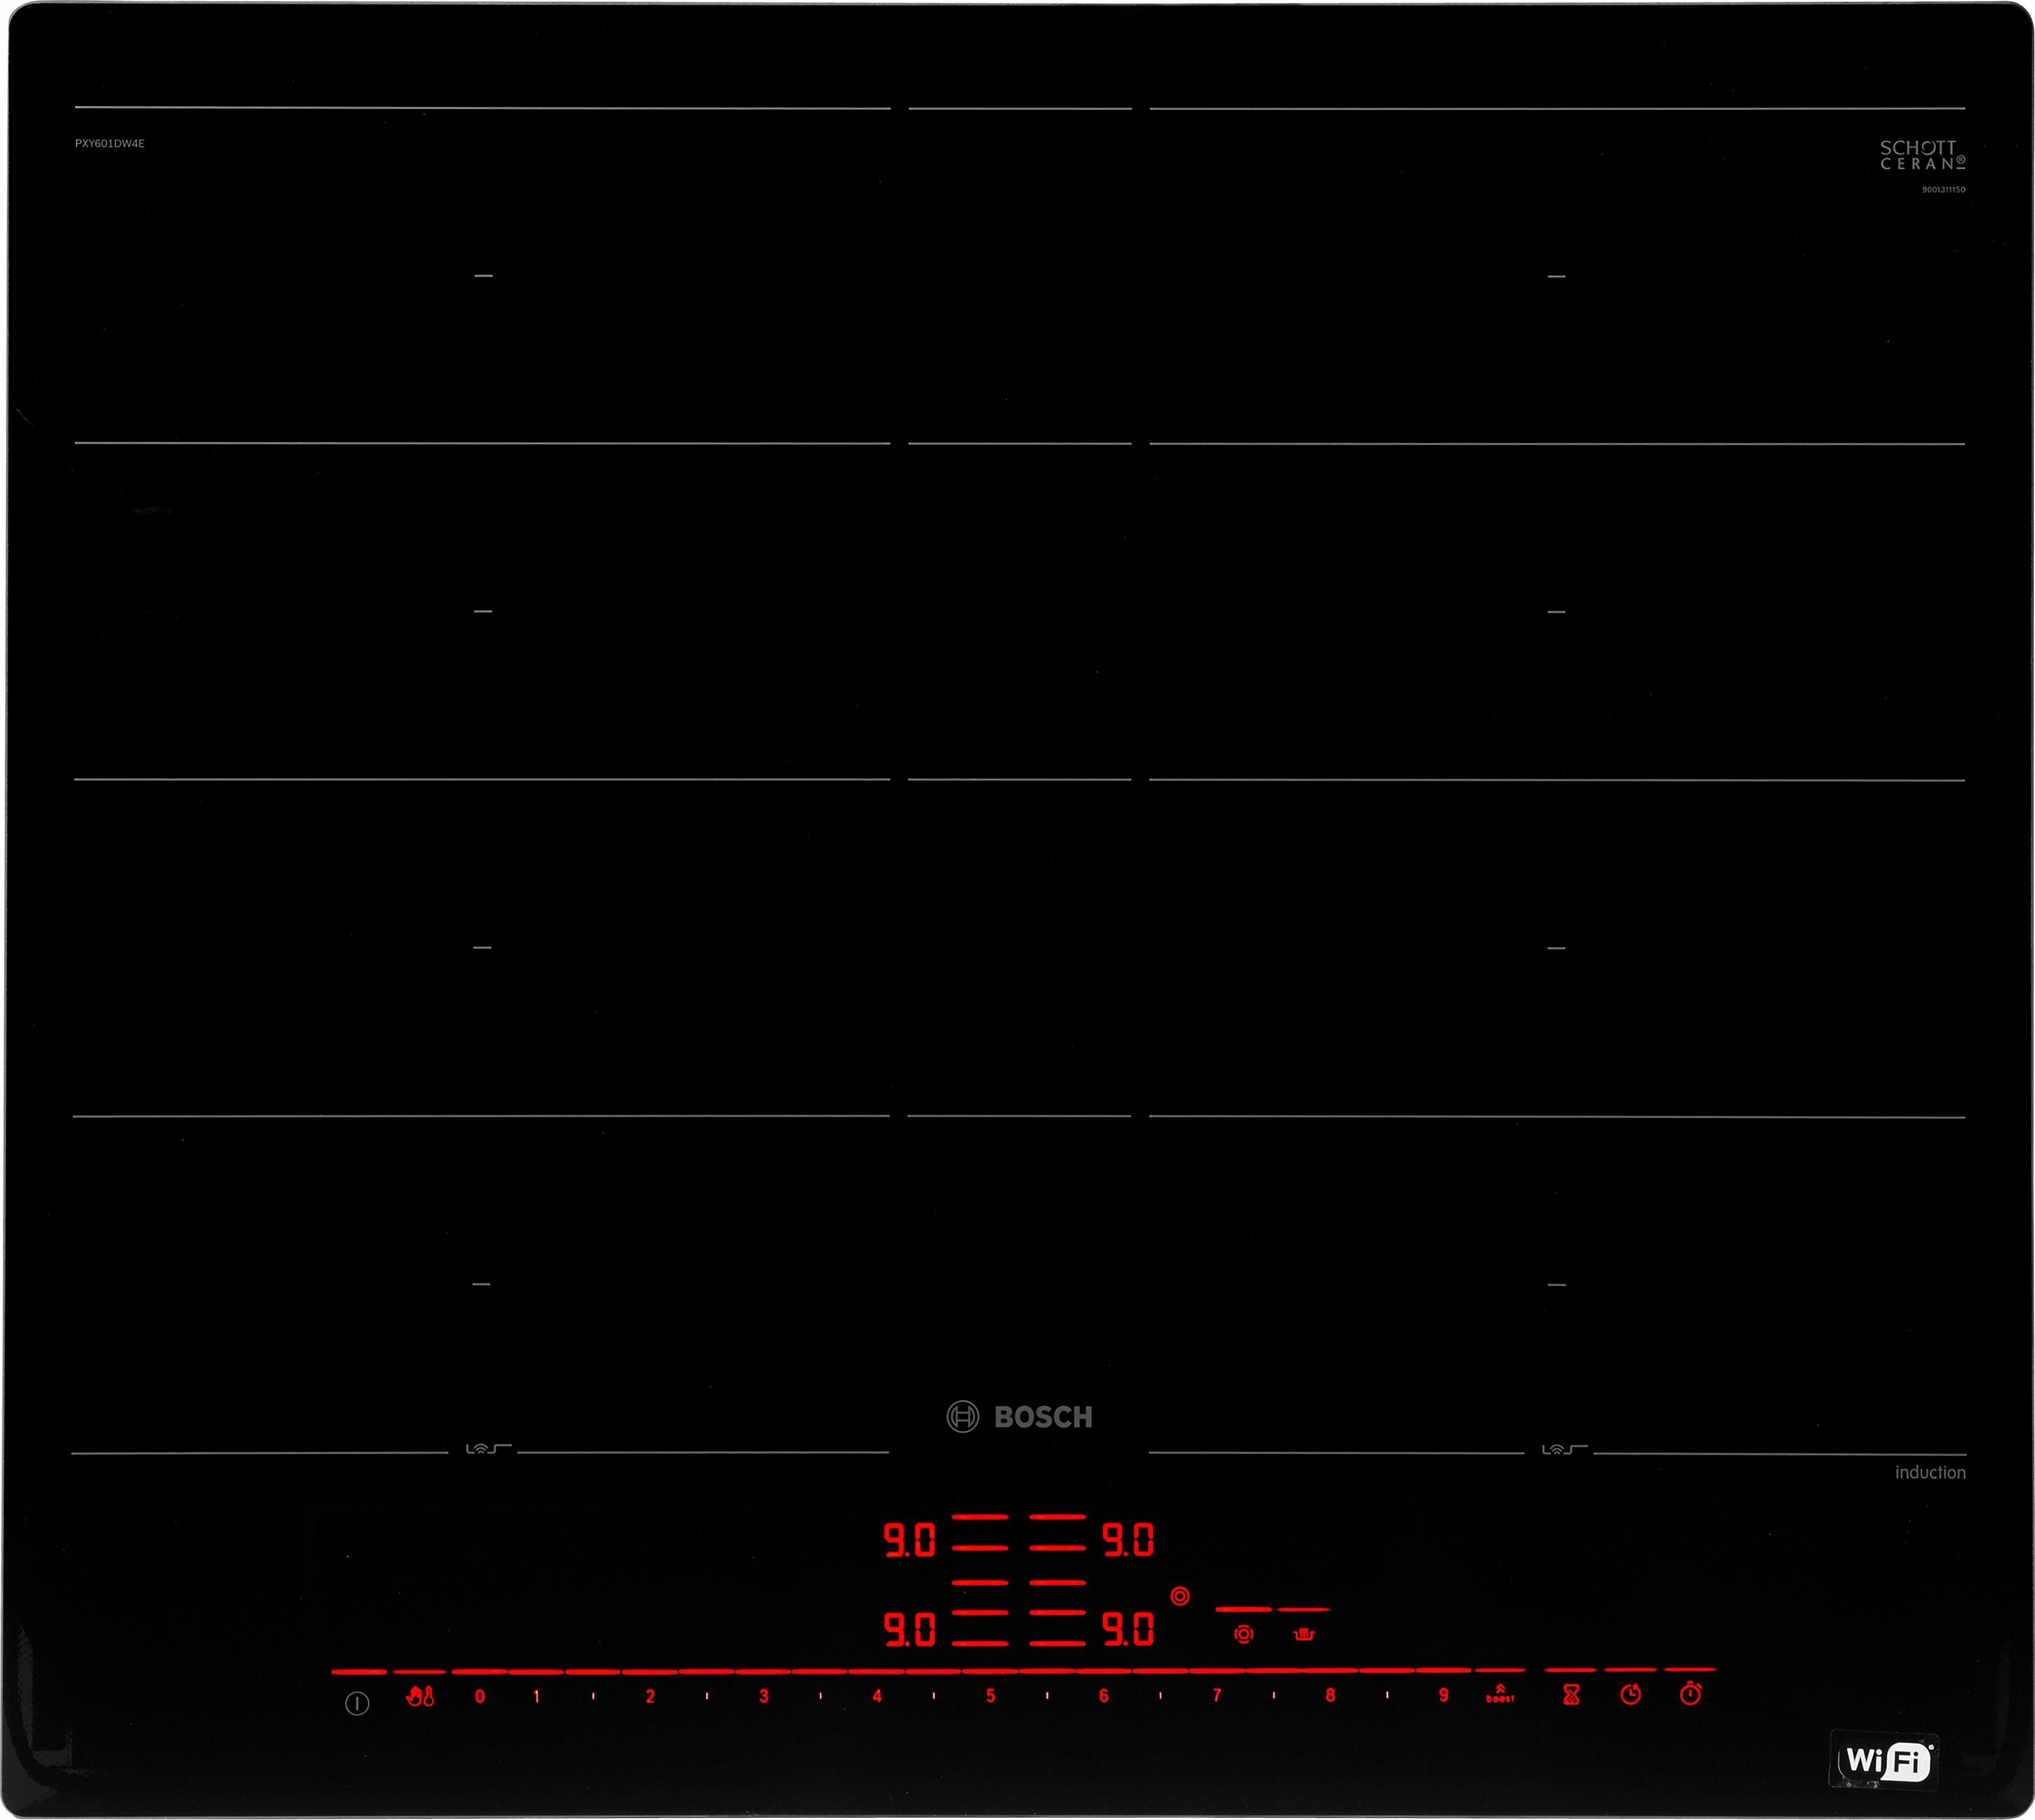 BOSCH Flex-Induktions-Kochfeld PXY601DW4E, mit DirectSelect Premium